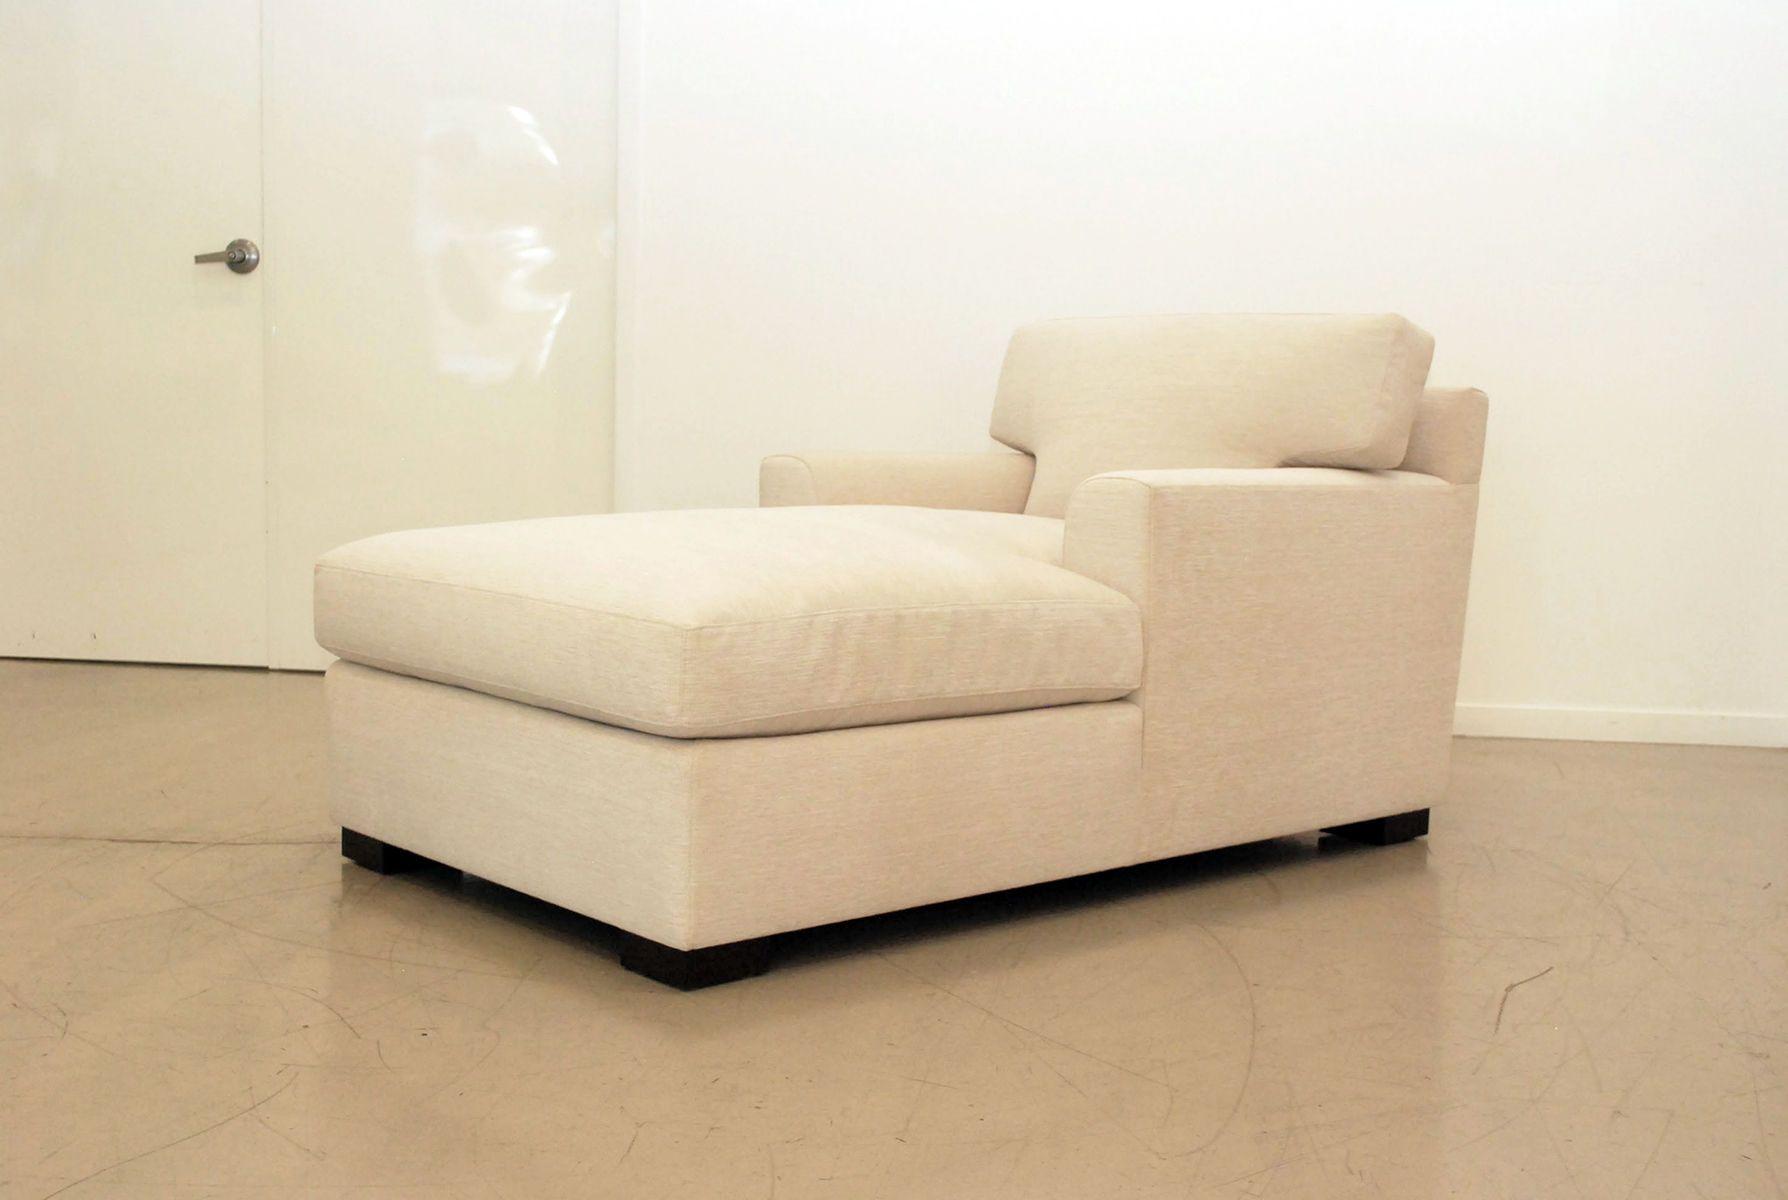 Custom Chaise Lounge Chair